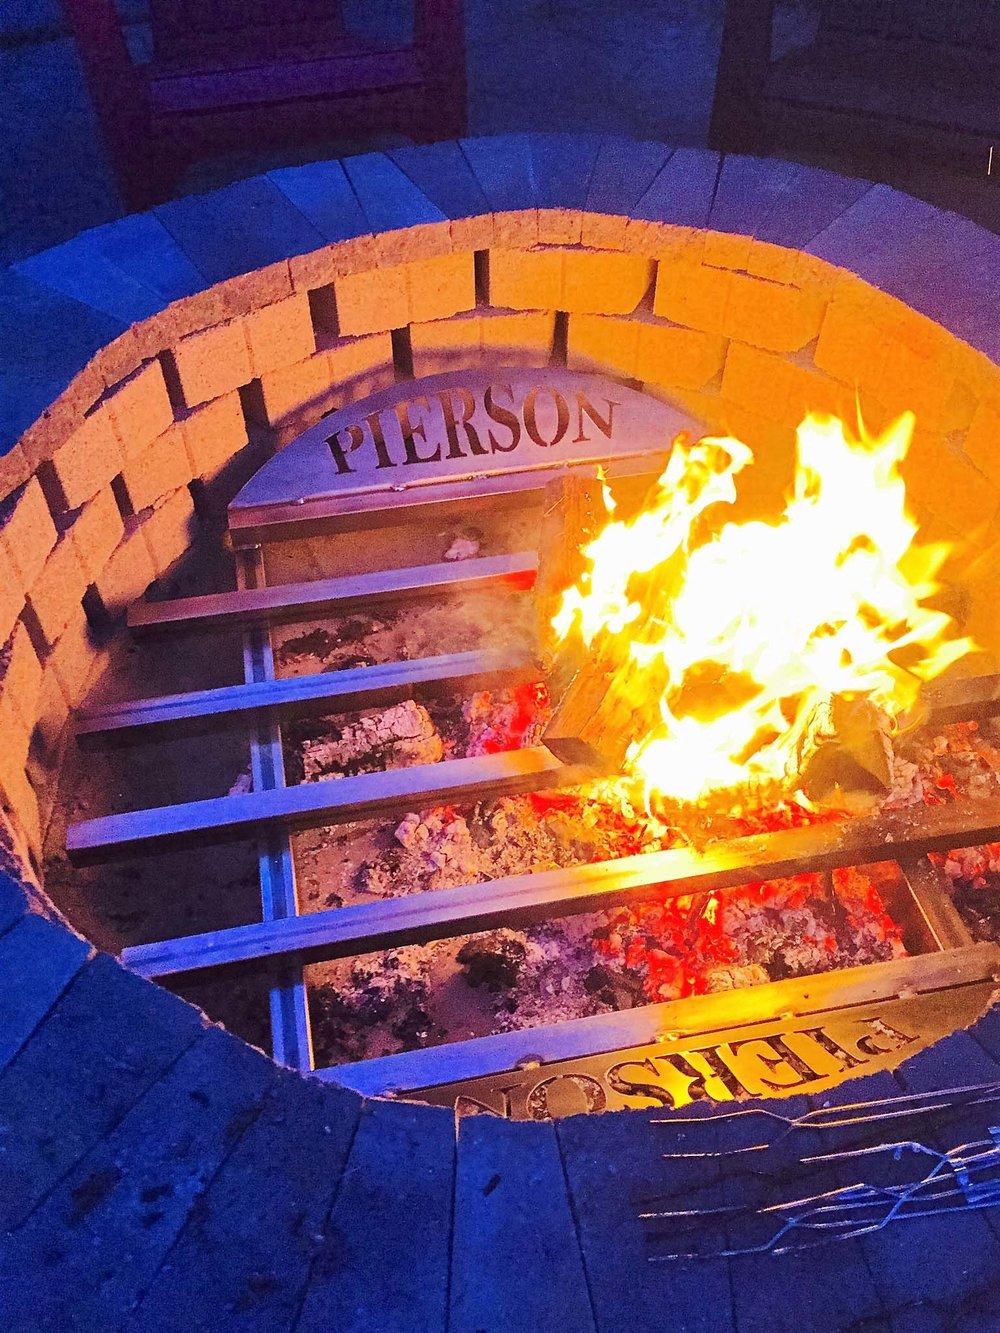 Pierson Fire Pit.jpg